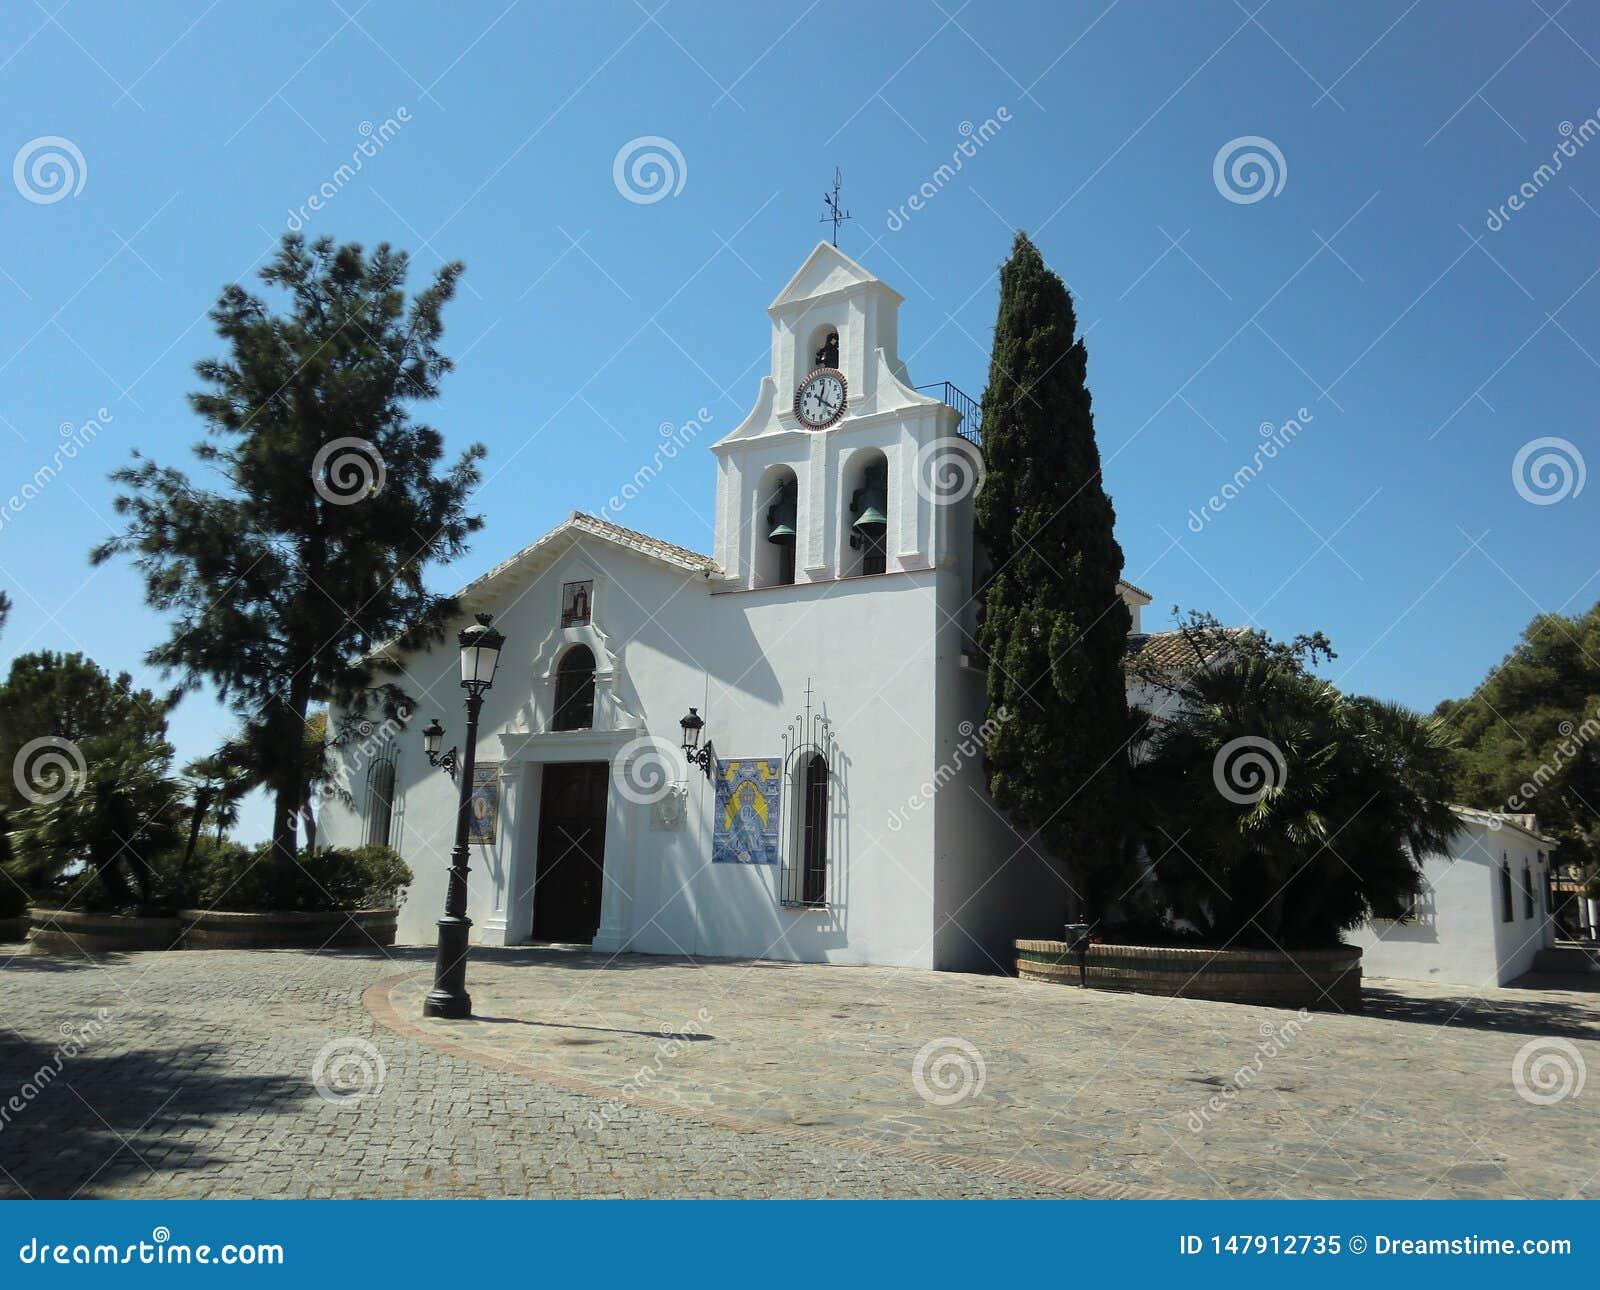 Benalmadena, Espagne 24 juillet 2013 : Façade principale de l église de la municipalité de Benalmadena